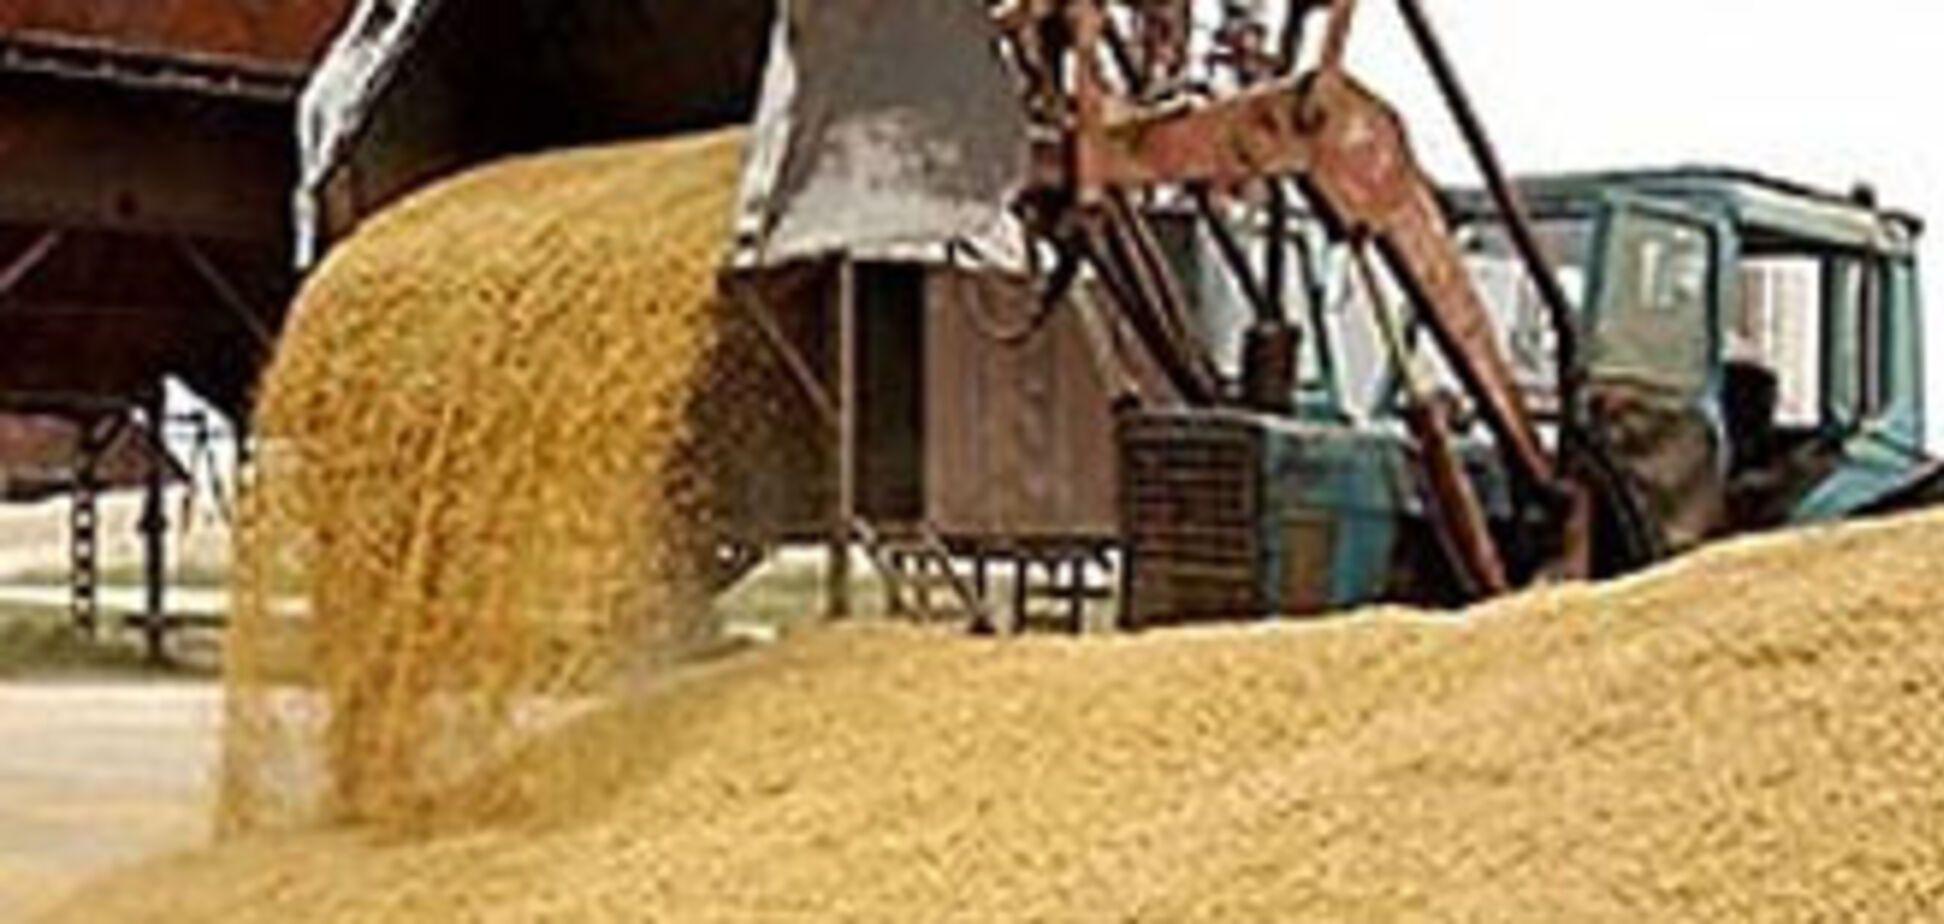 Зернотрейдери перестали закуповувати пшеницю